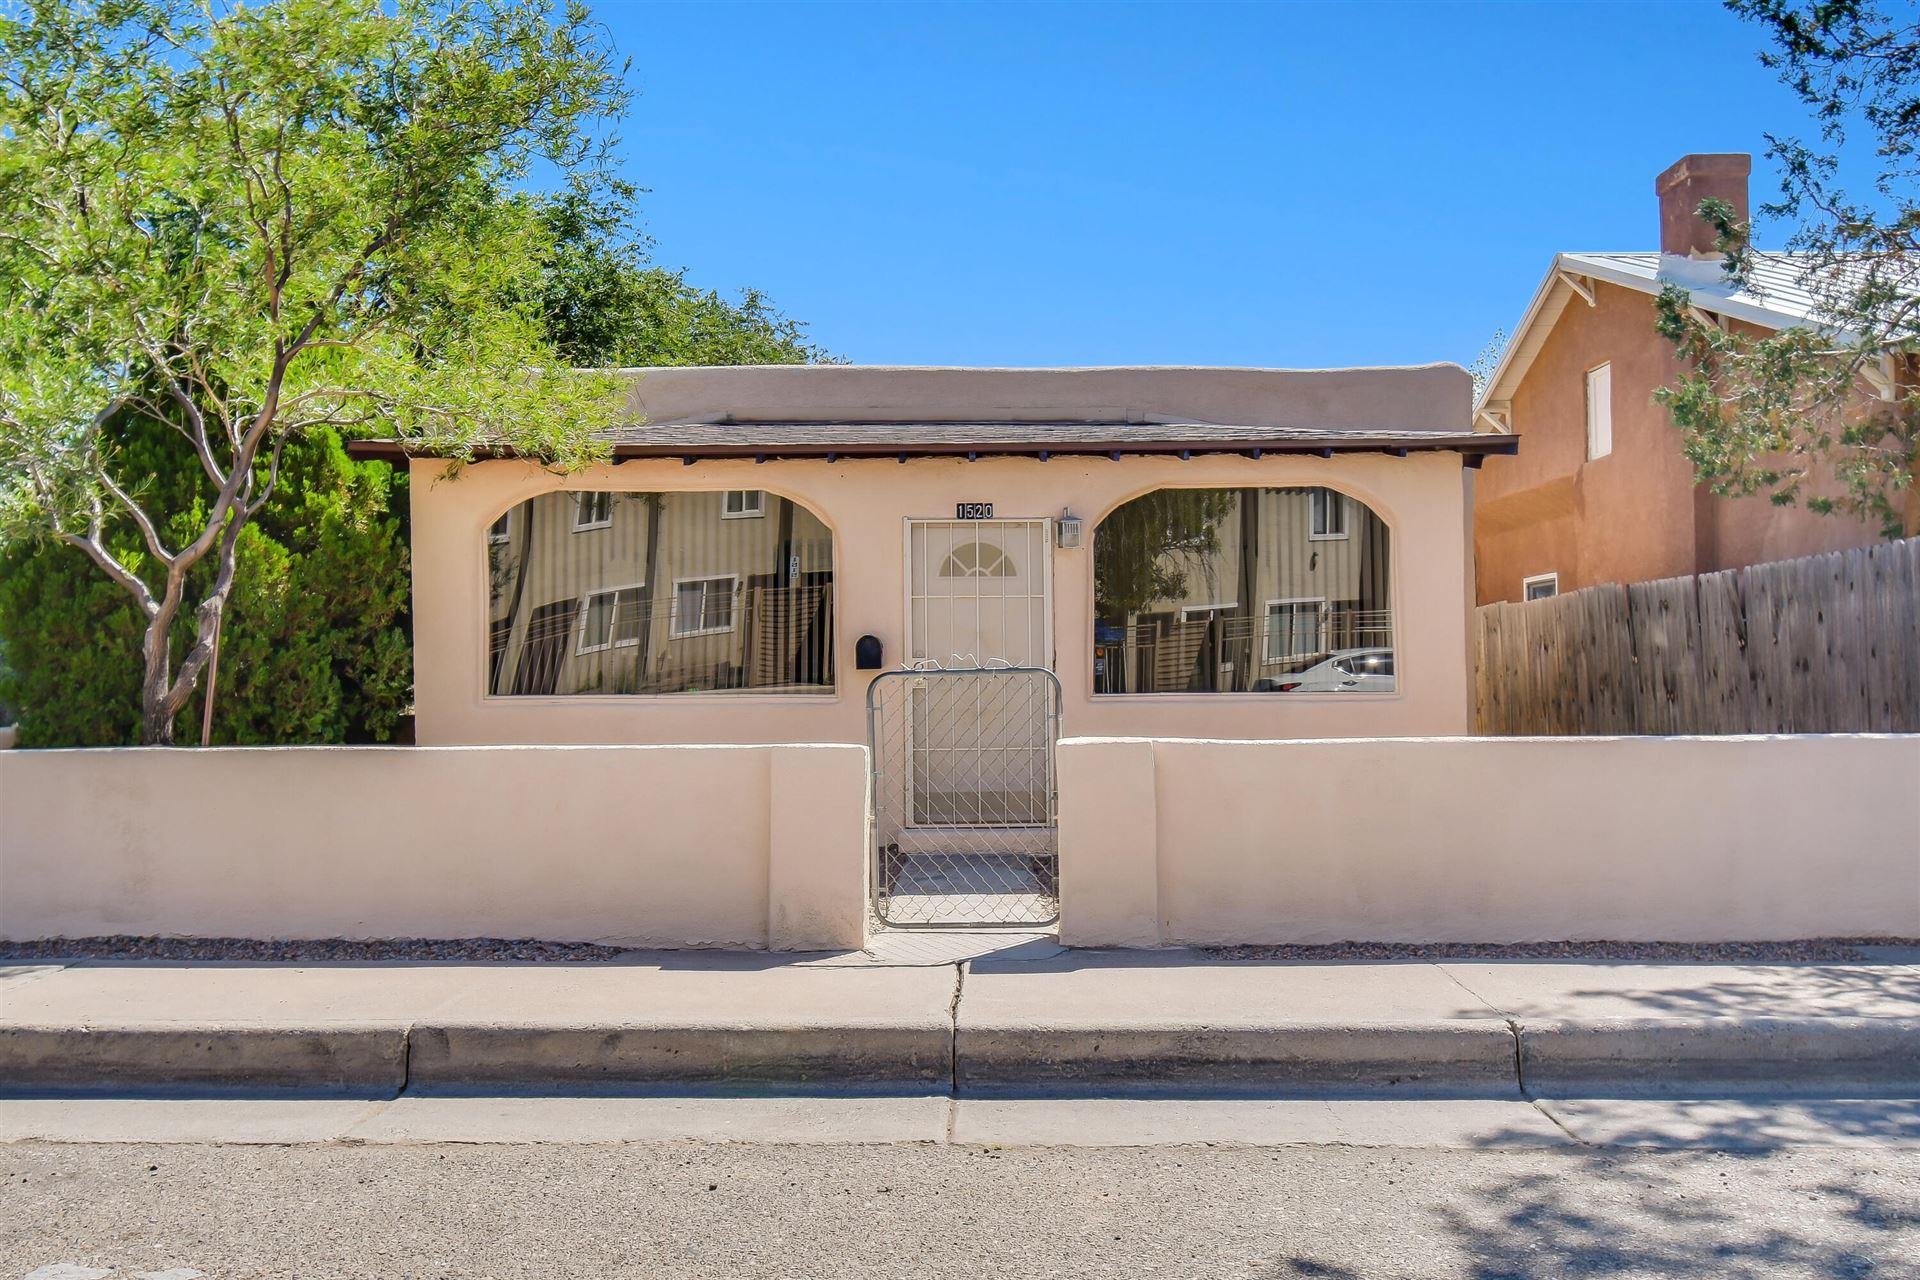 1520 8TH Street NW, Albuquerque, NM 87102 - #: 1000858